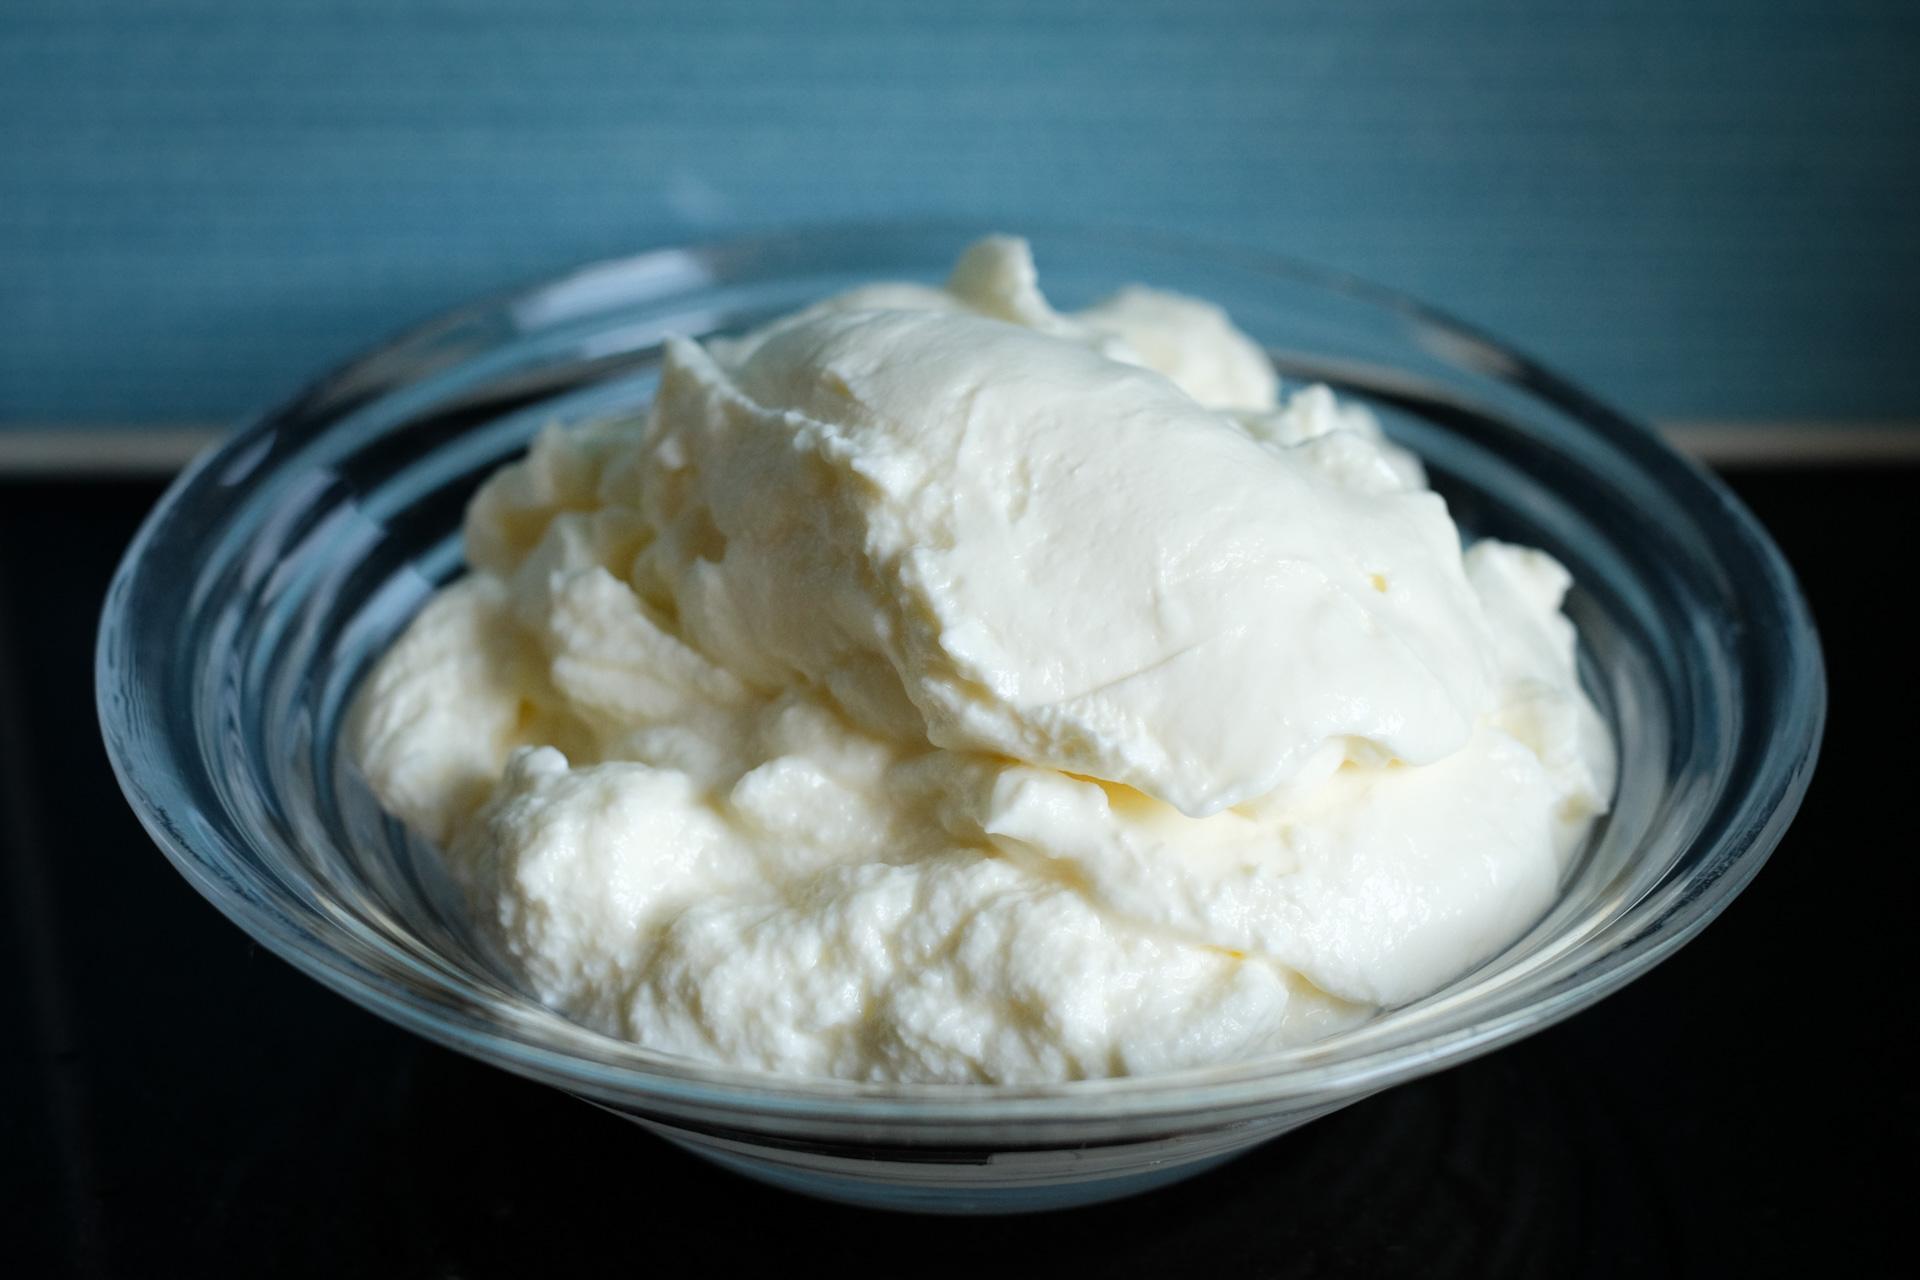 Paksua jogurttia lasikulhossa